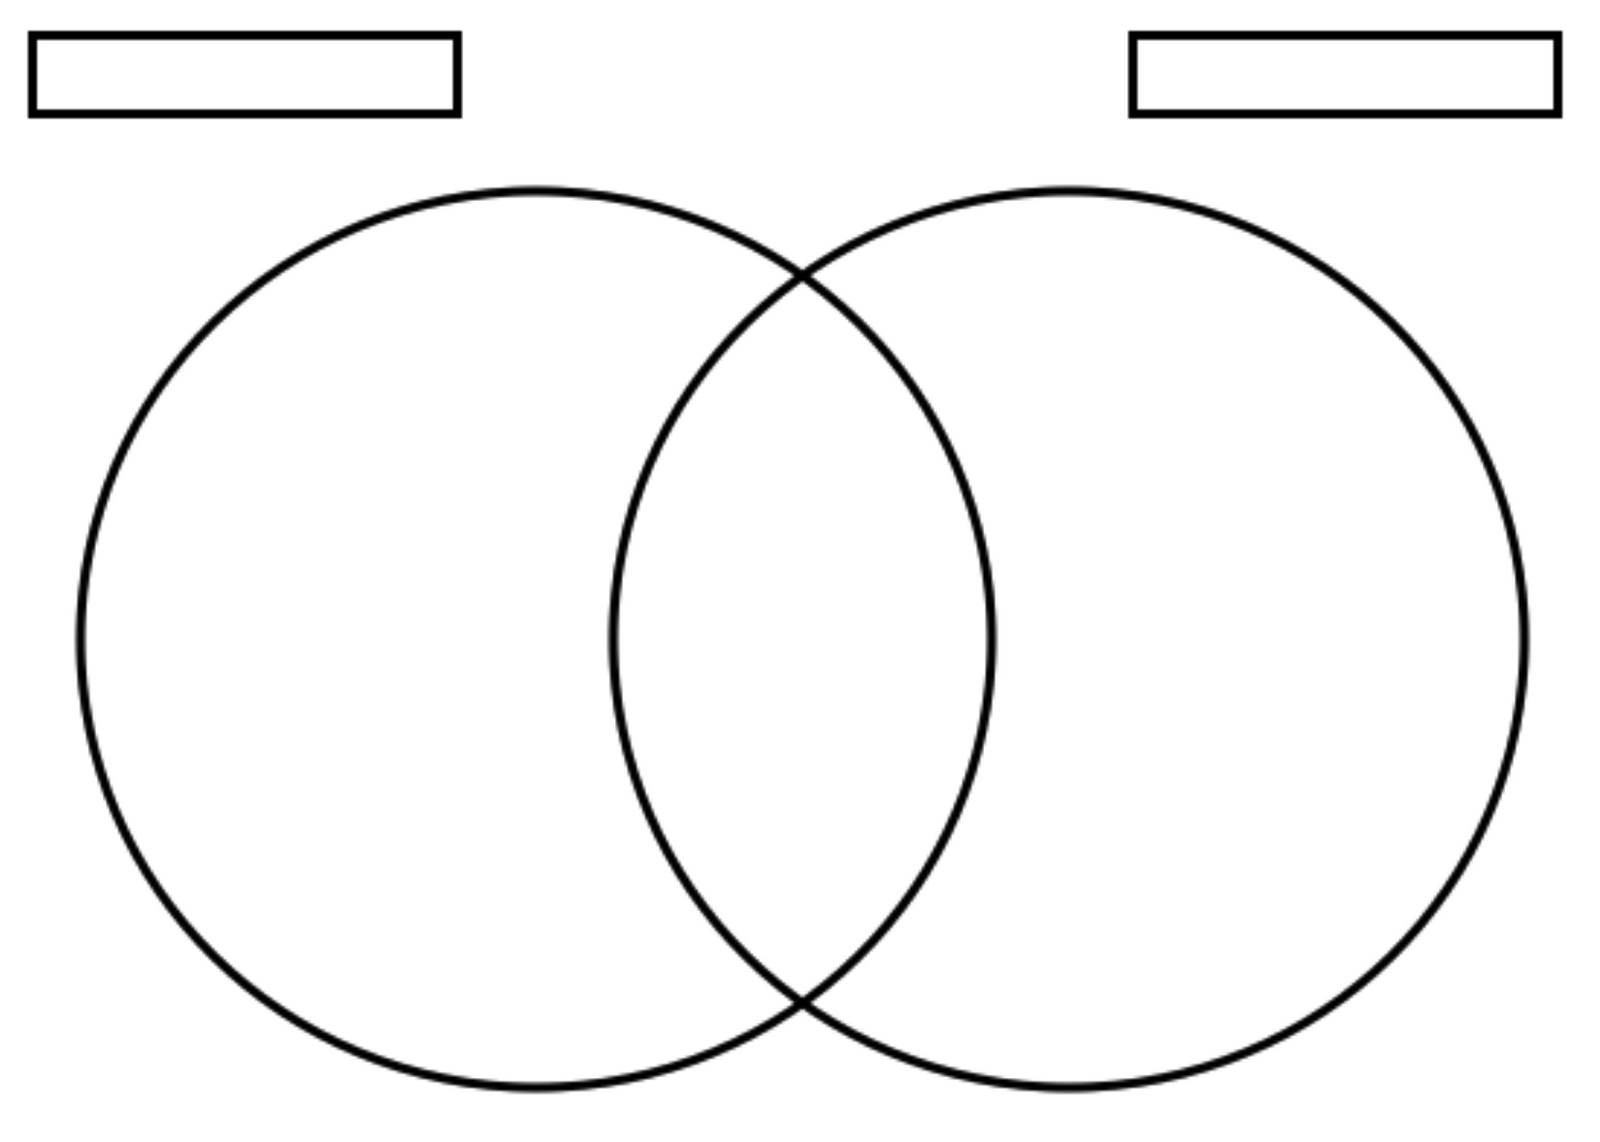 Venn Diagram Template | School Stuff | Pinterest | Venn Diagram - Free Printable Venn Diagram